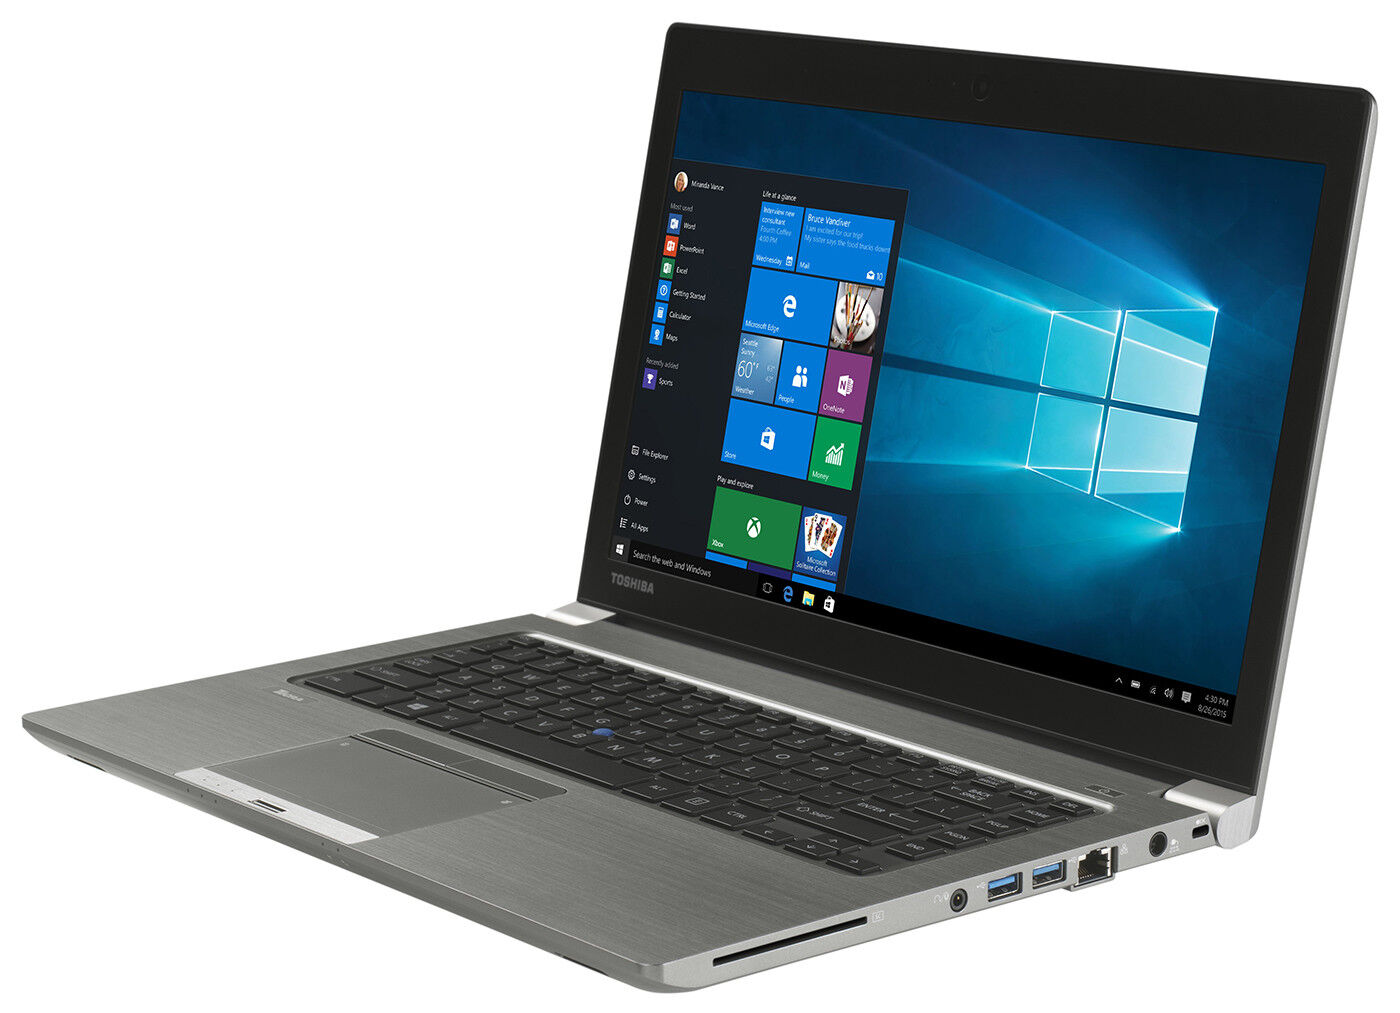 "Toshiba Tecra Z40 14"" HD+ Intel i5 5300U 8GB RAM 256GB SSD Webcam Windows 10 Pro"